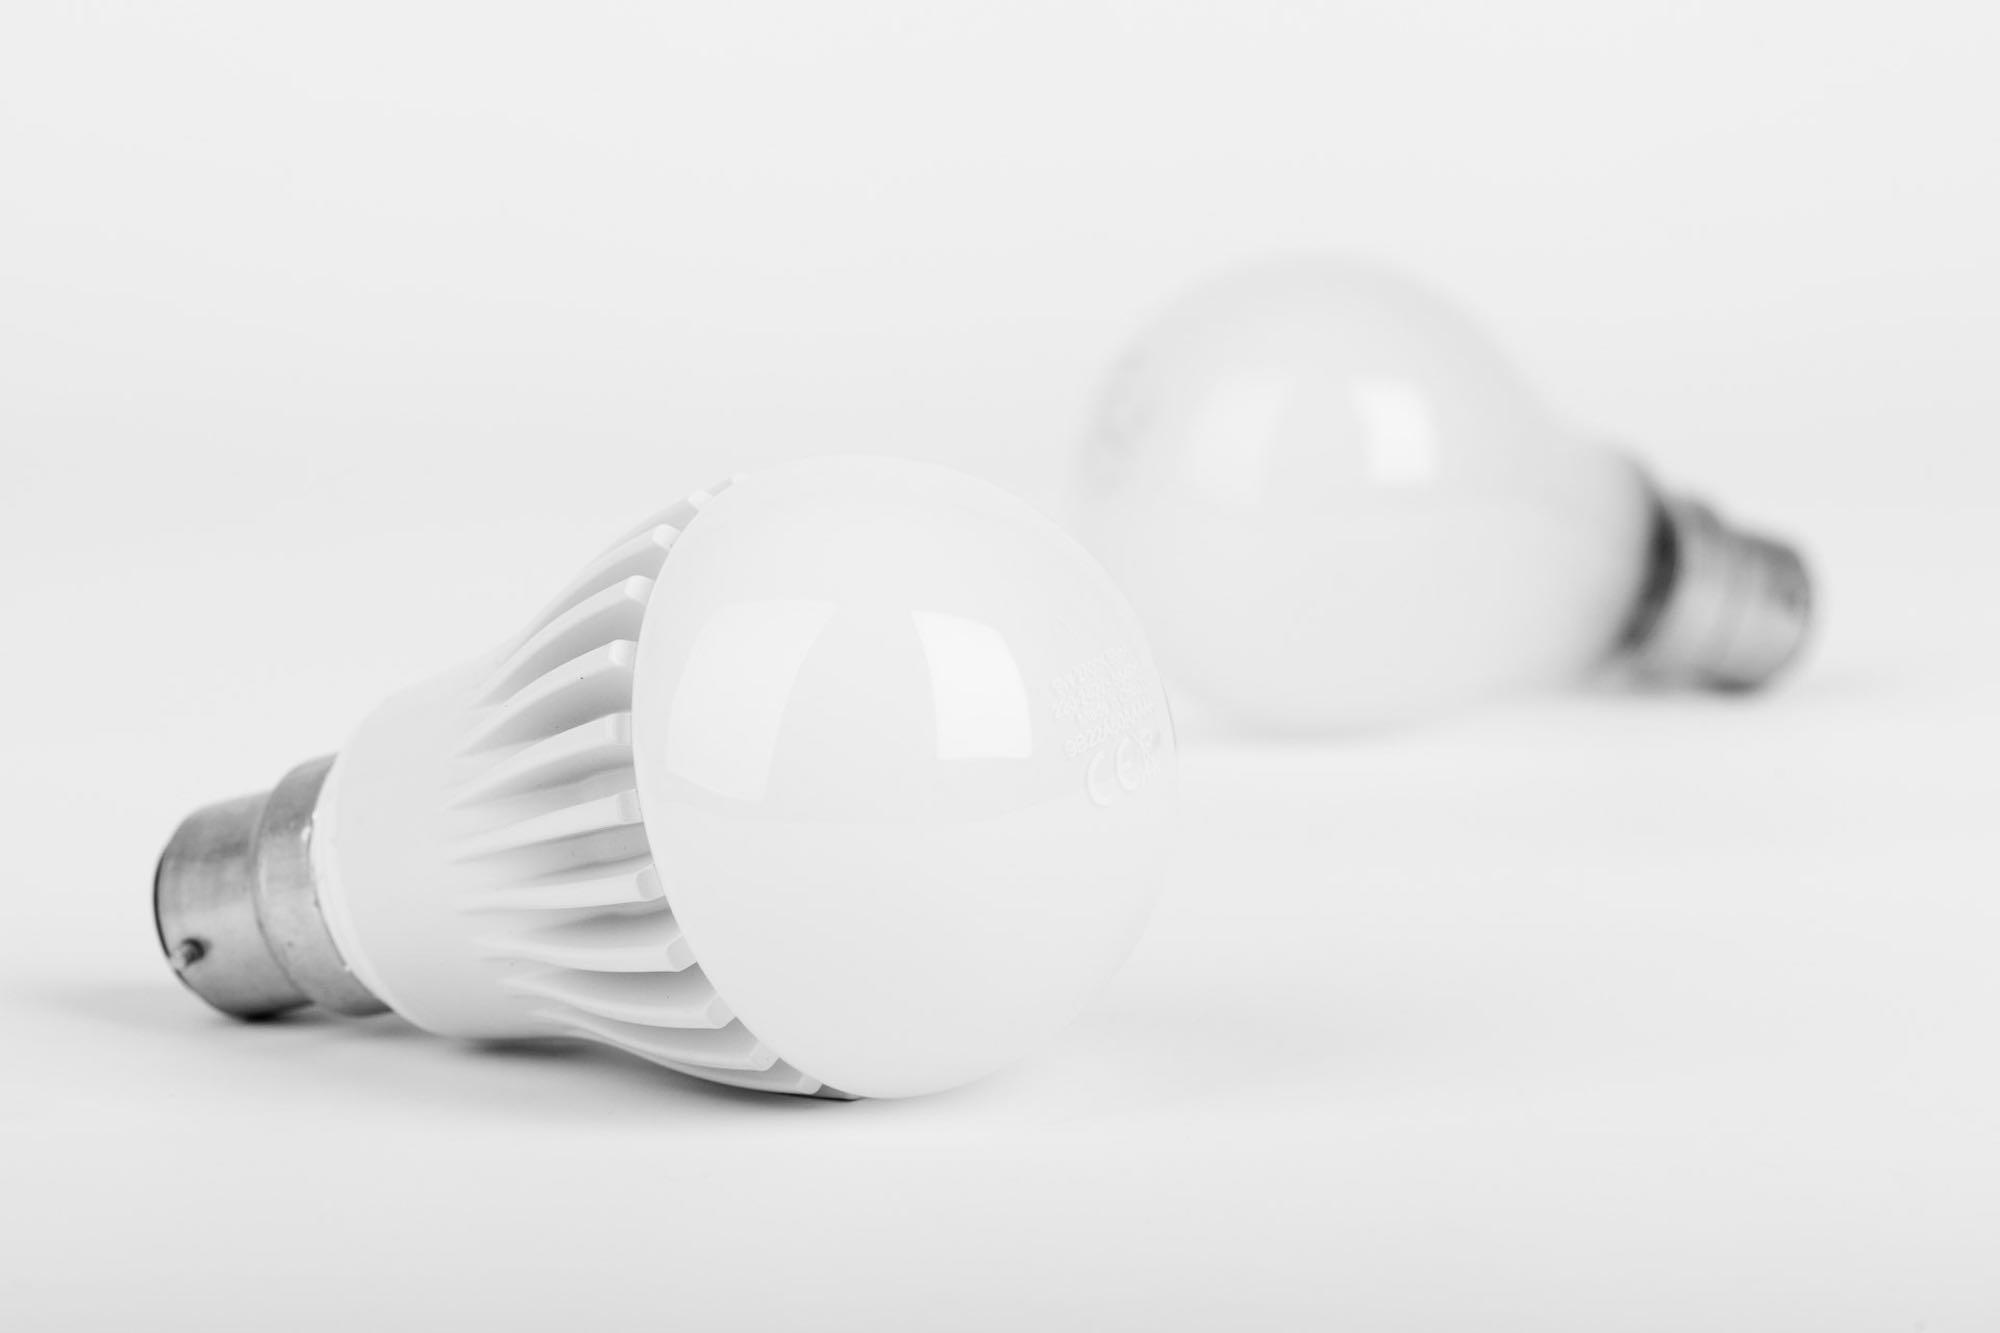 incandescent LED light bulb